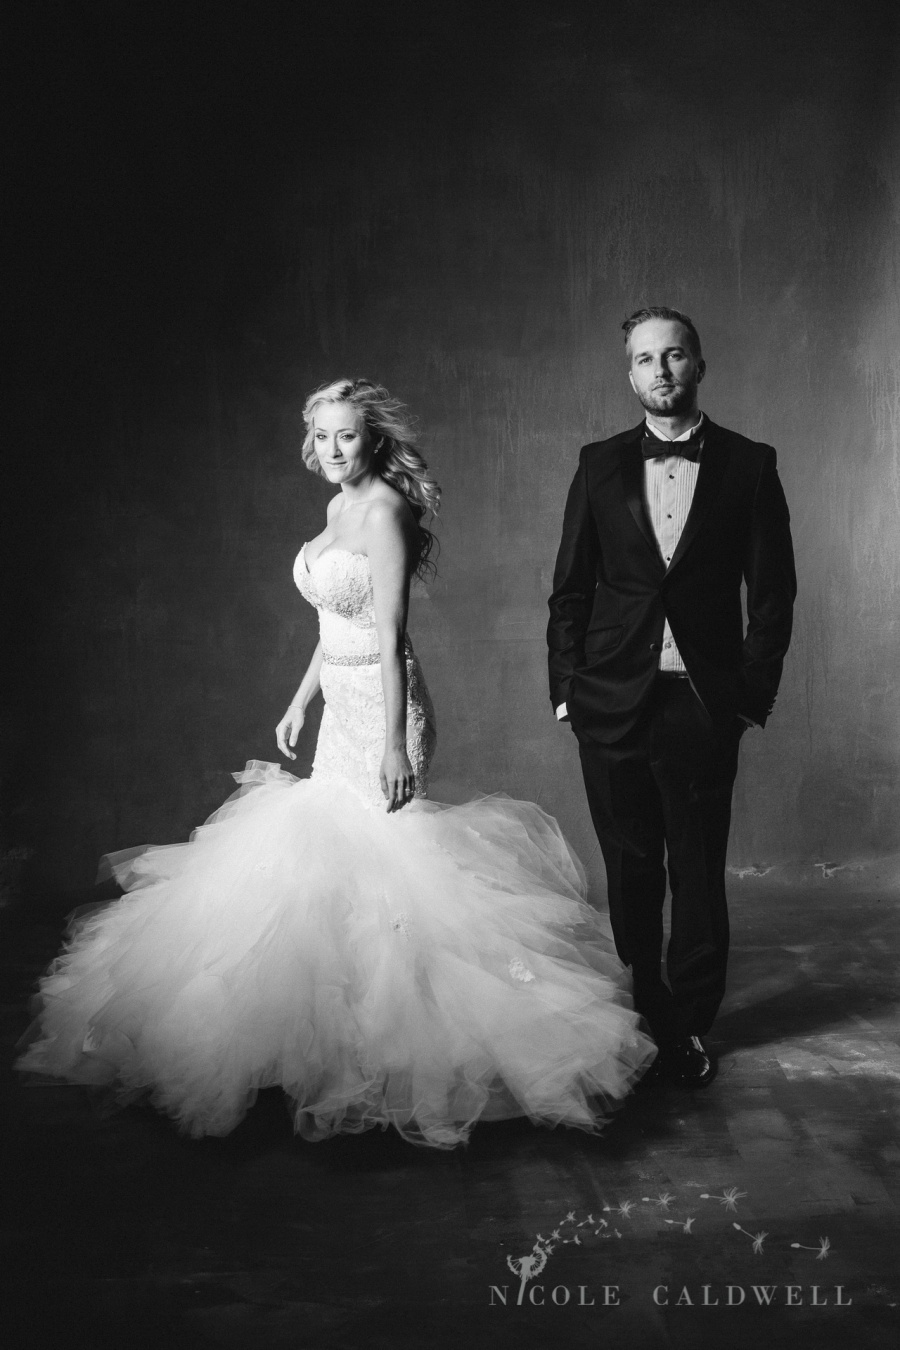 bridal ortraits by nicole caldwell 07